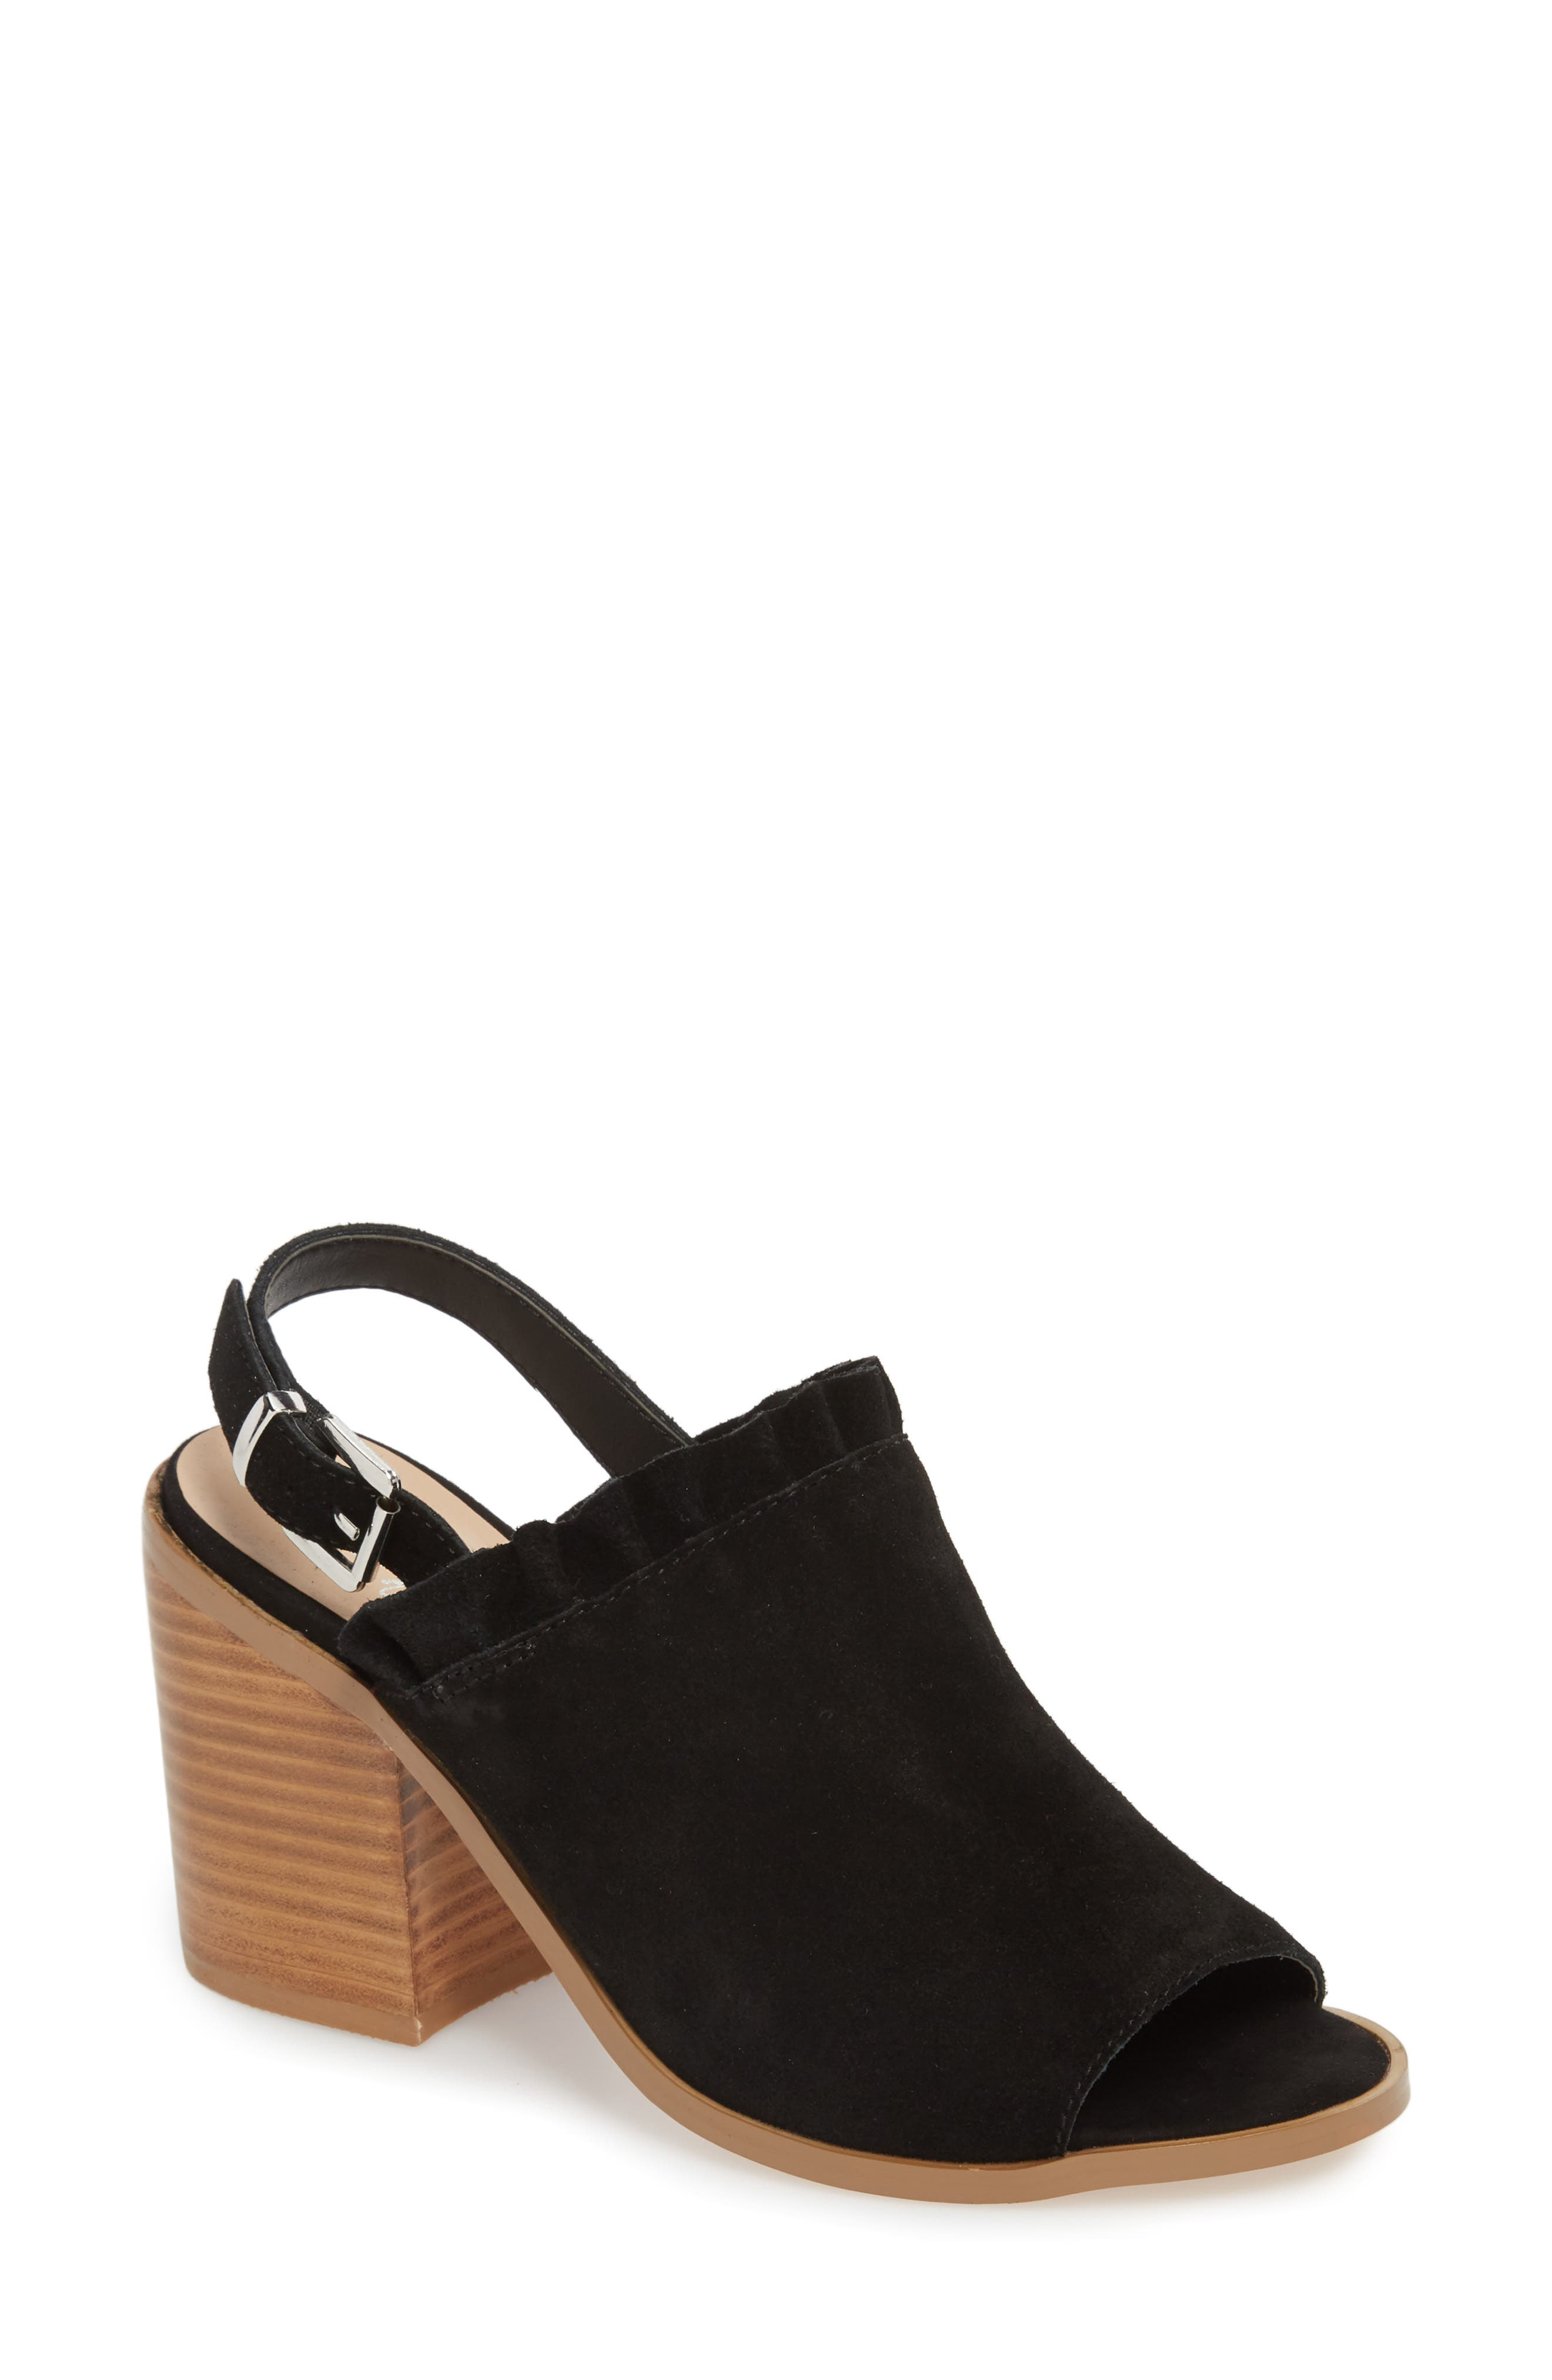 SBICCA Carla Block Heel Sandal, Main, color, BLACK